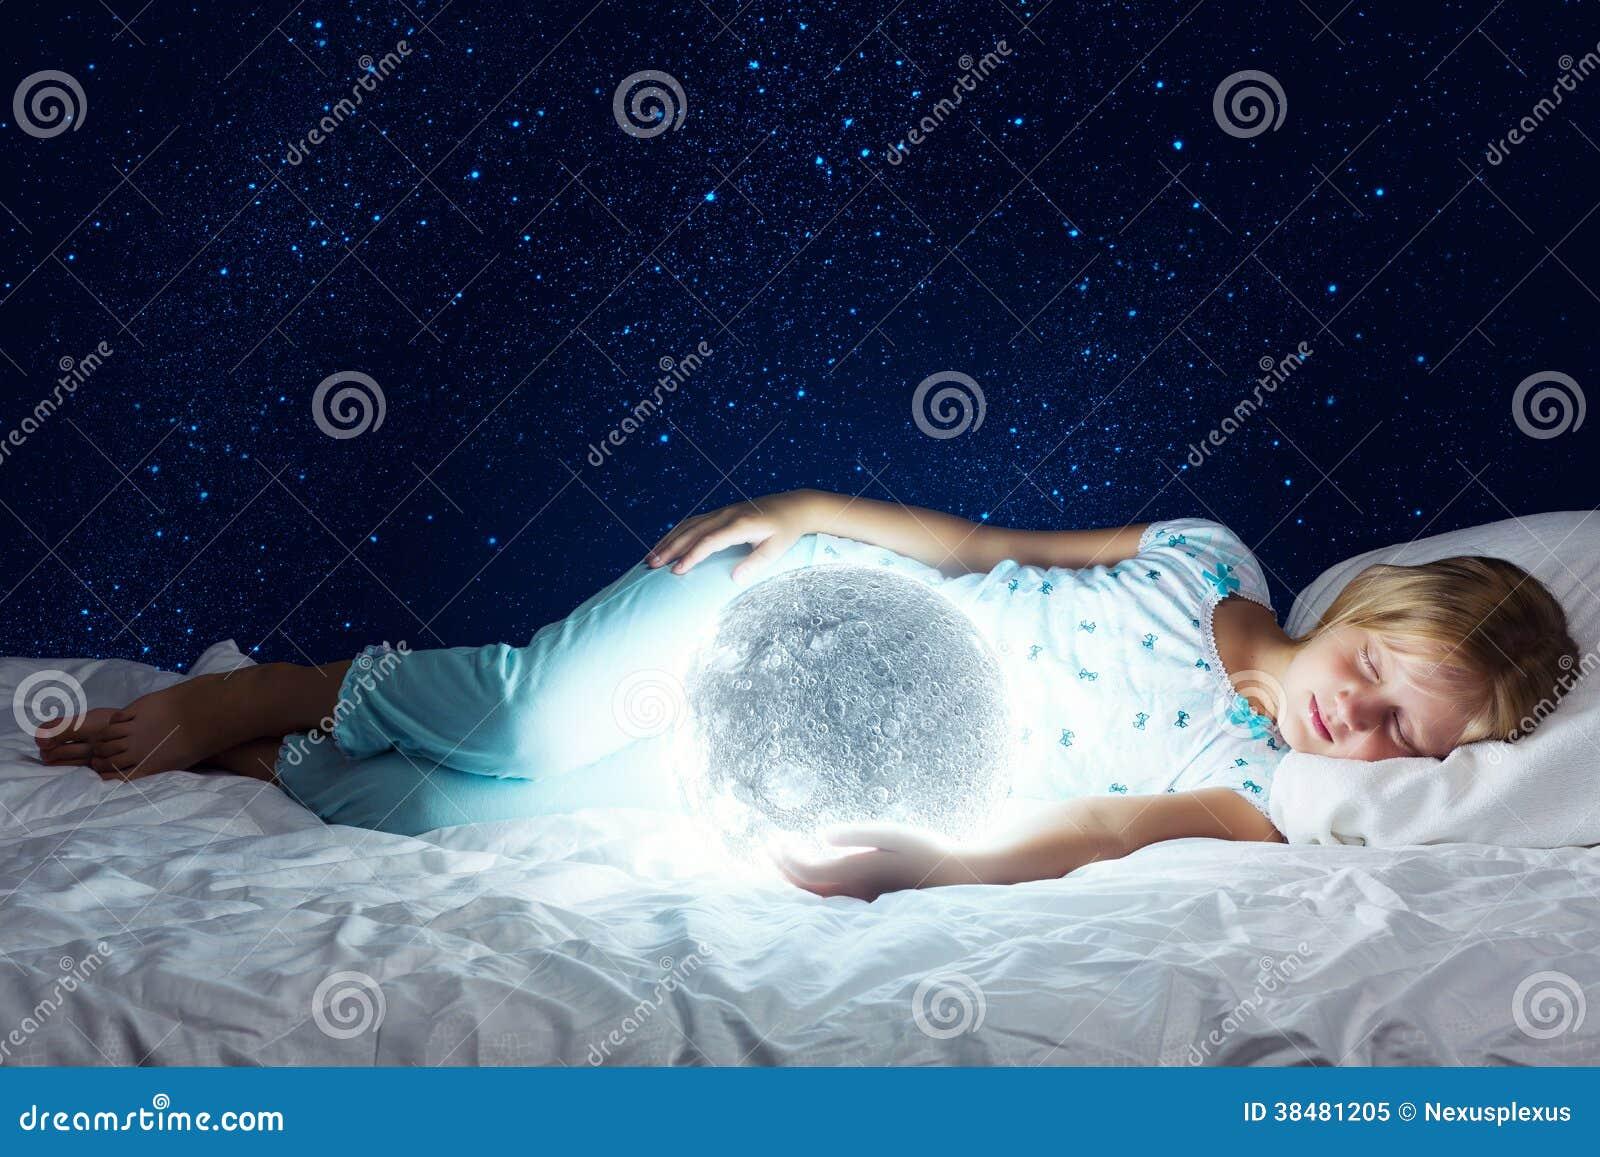 Good Night Stock Image Image Of Bedroom Moon Bright